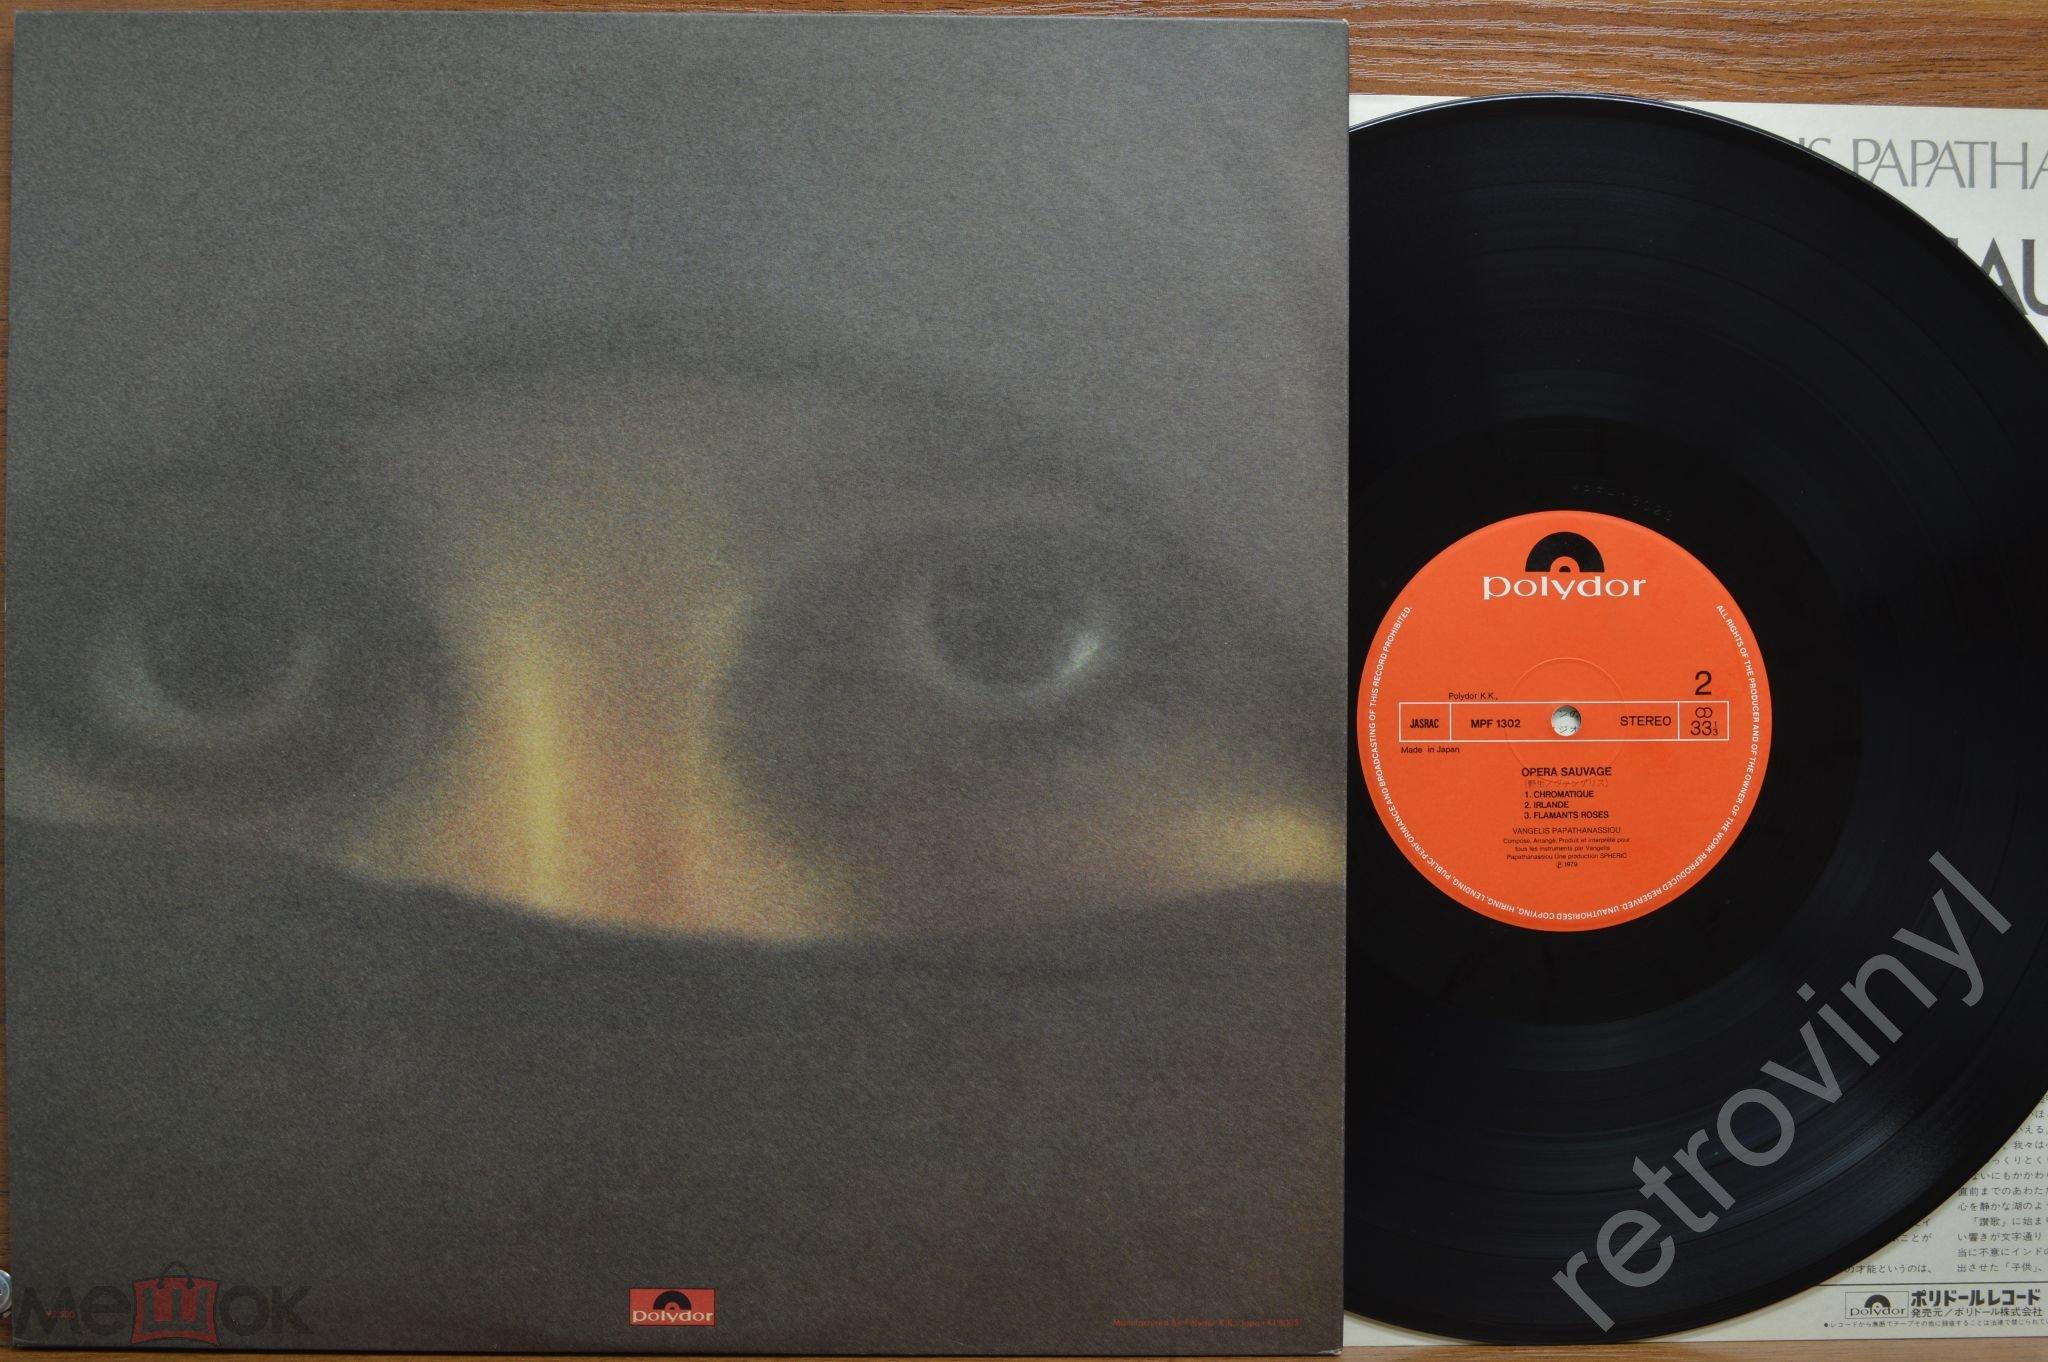 VANGELIS PAPATHANASSIOU - Opéra Sauvage - MPF 1302 Polydor ORIGINAL 1980 года JAPAN пресс MINT